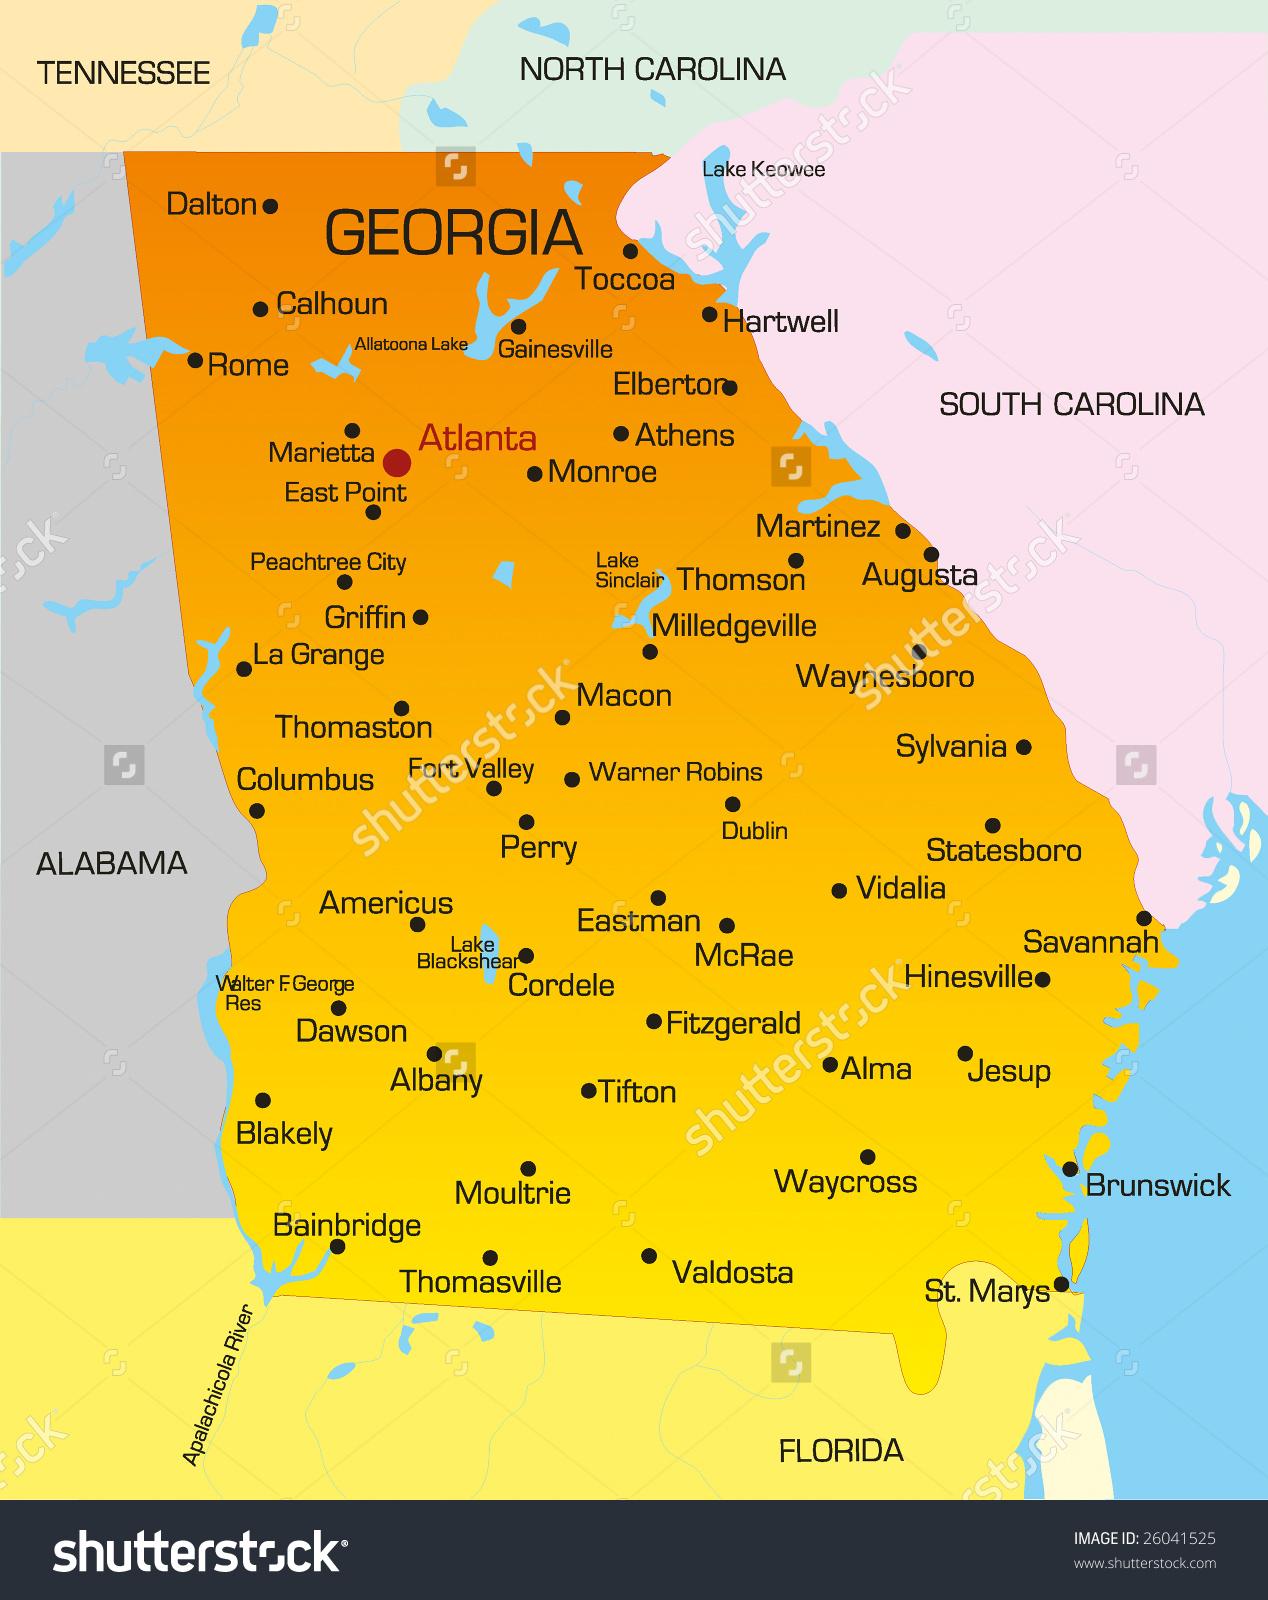 Georgia on us map clipart clip art free stock Georgia on us map clipart - ClipartNinja clip art free stock